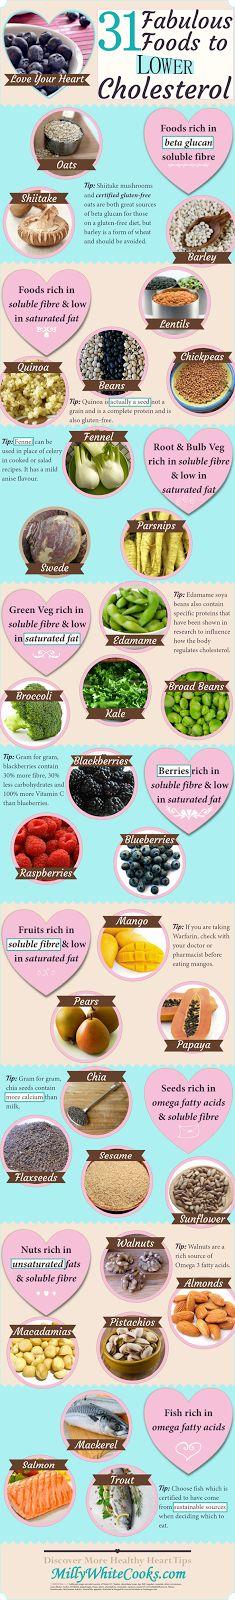 31 best low cholesterol images on pinterest lower cholesterol 31 fabulous foods to lower cholesterol infographic forumfinder Images